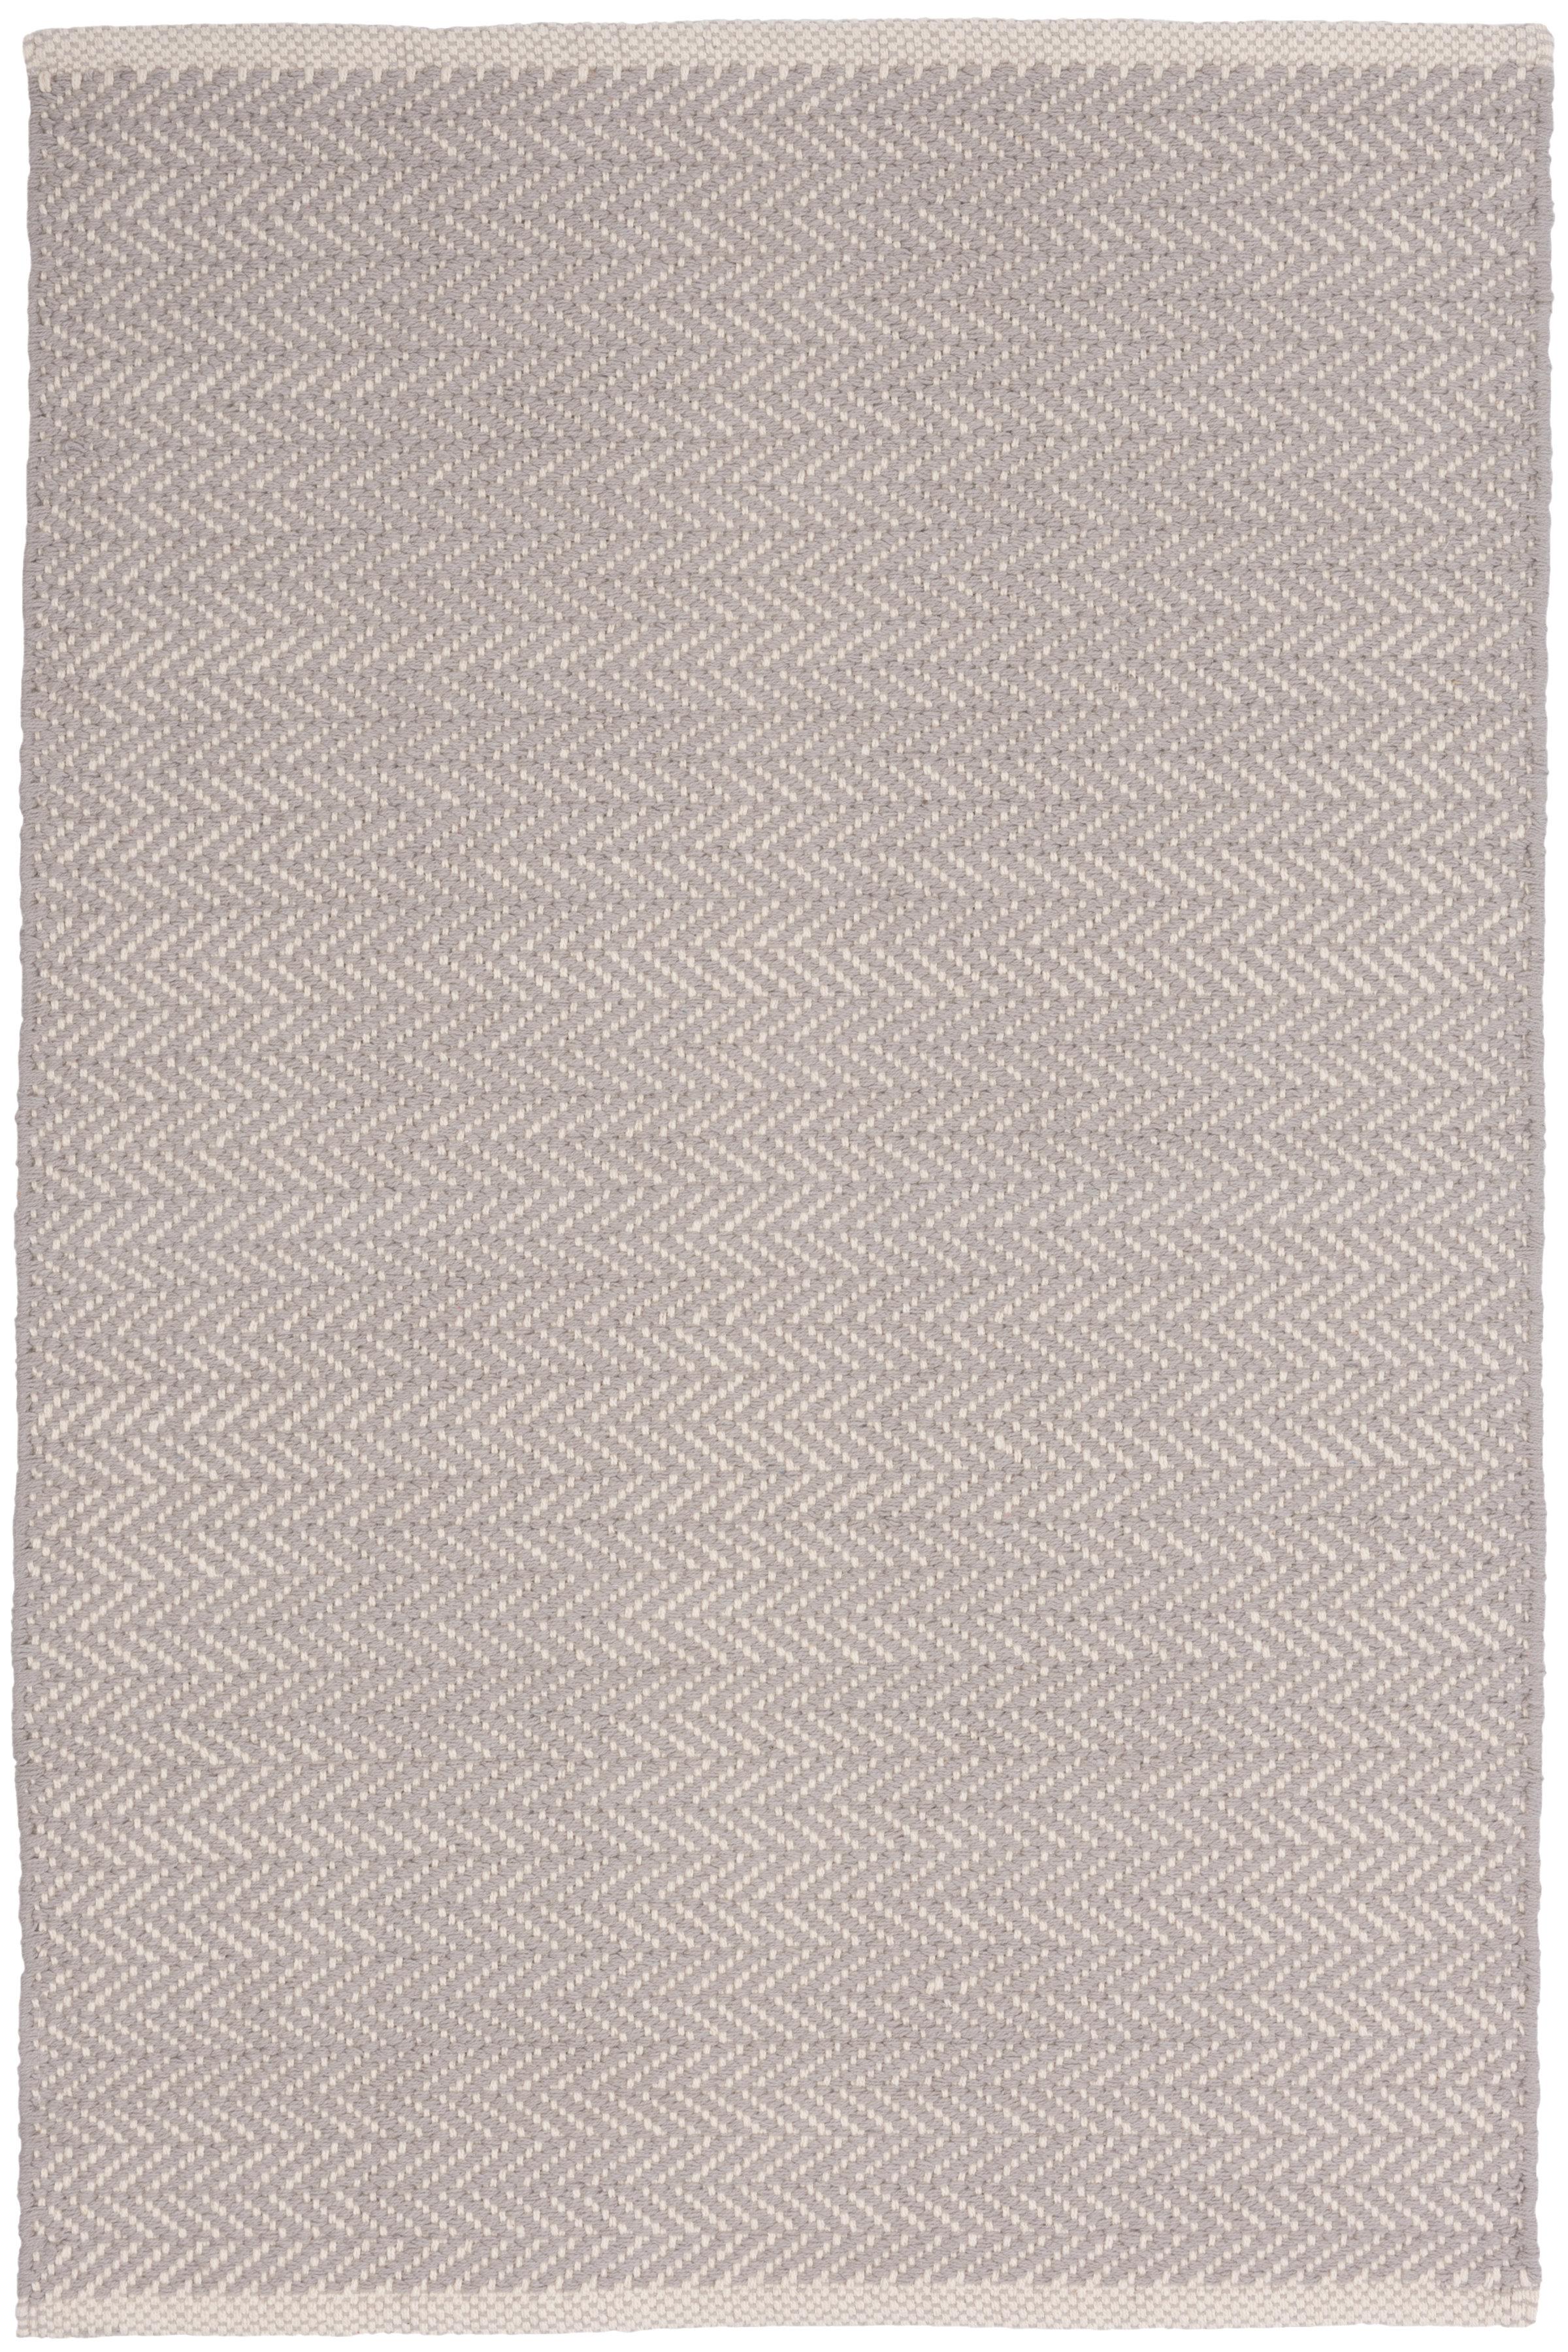 Herringbone Hand Woven Grey Area Rug